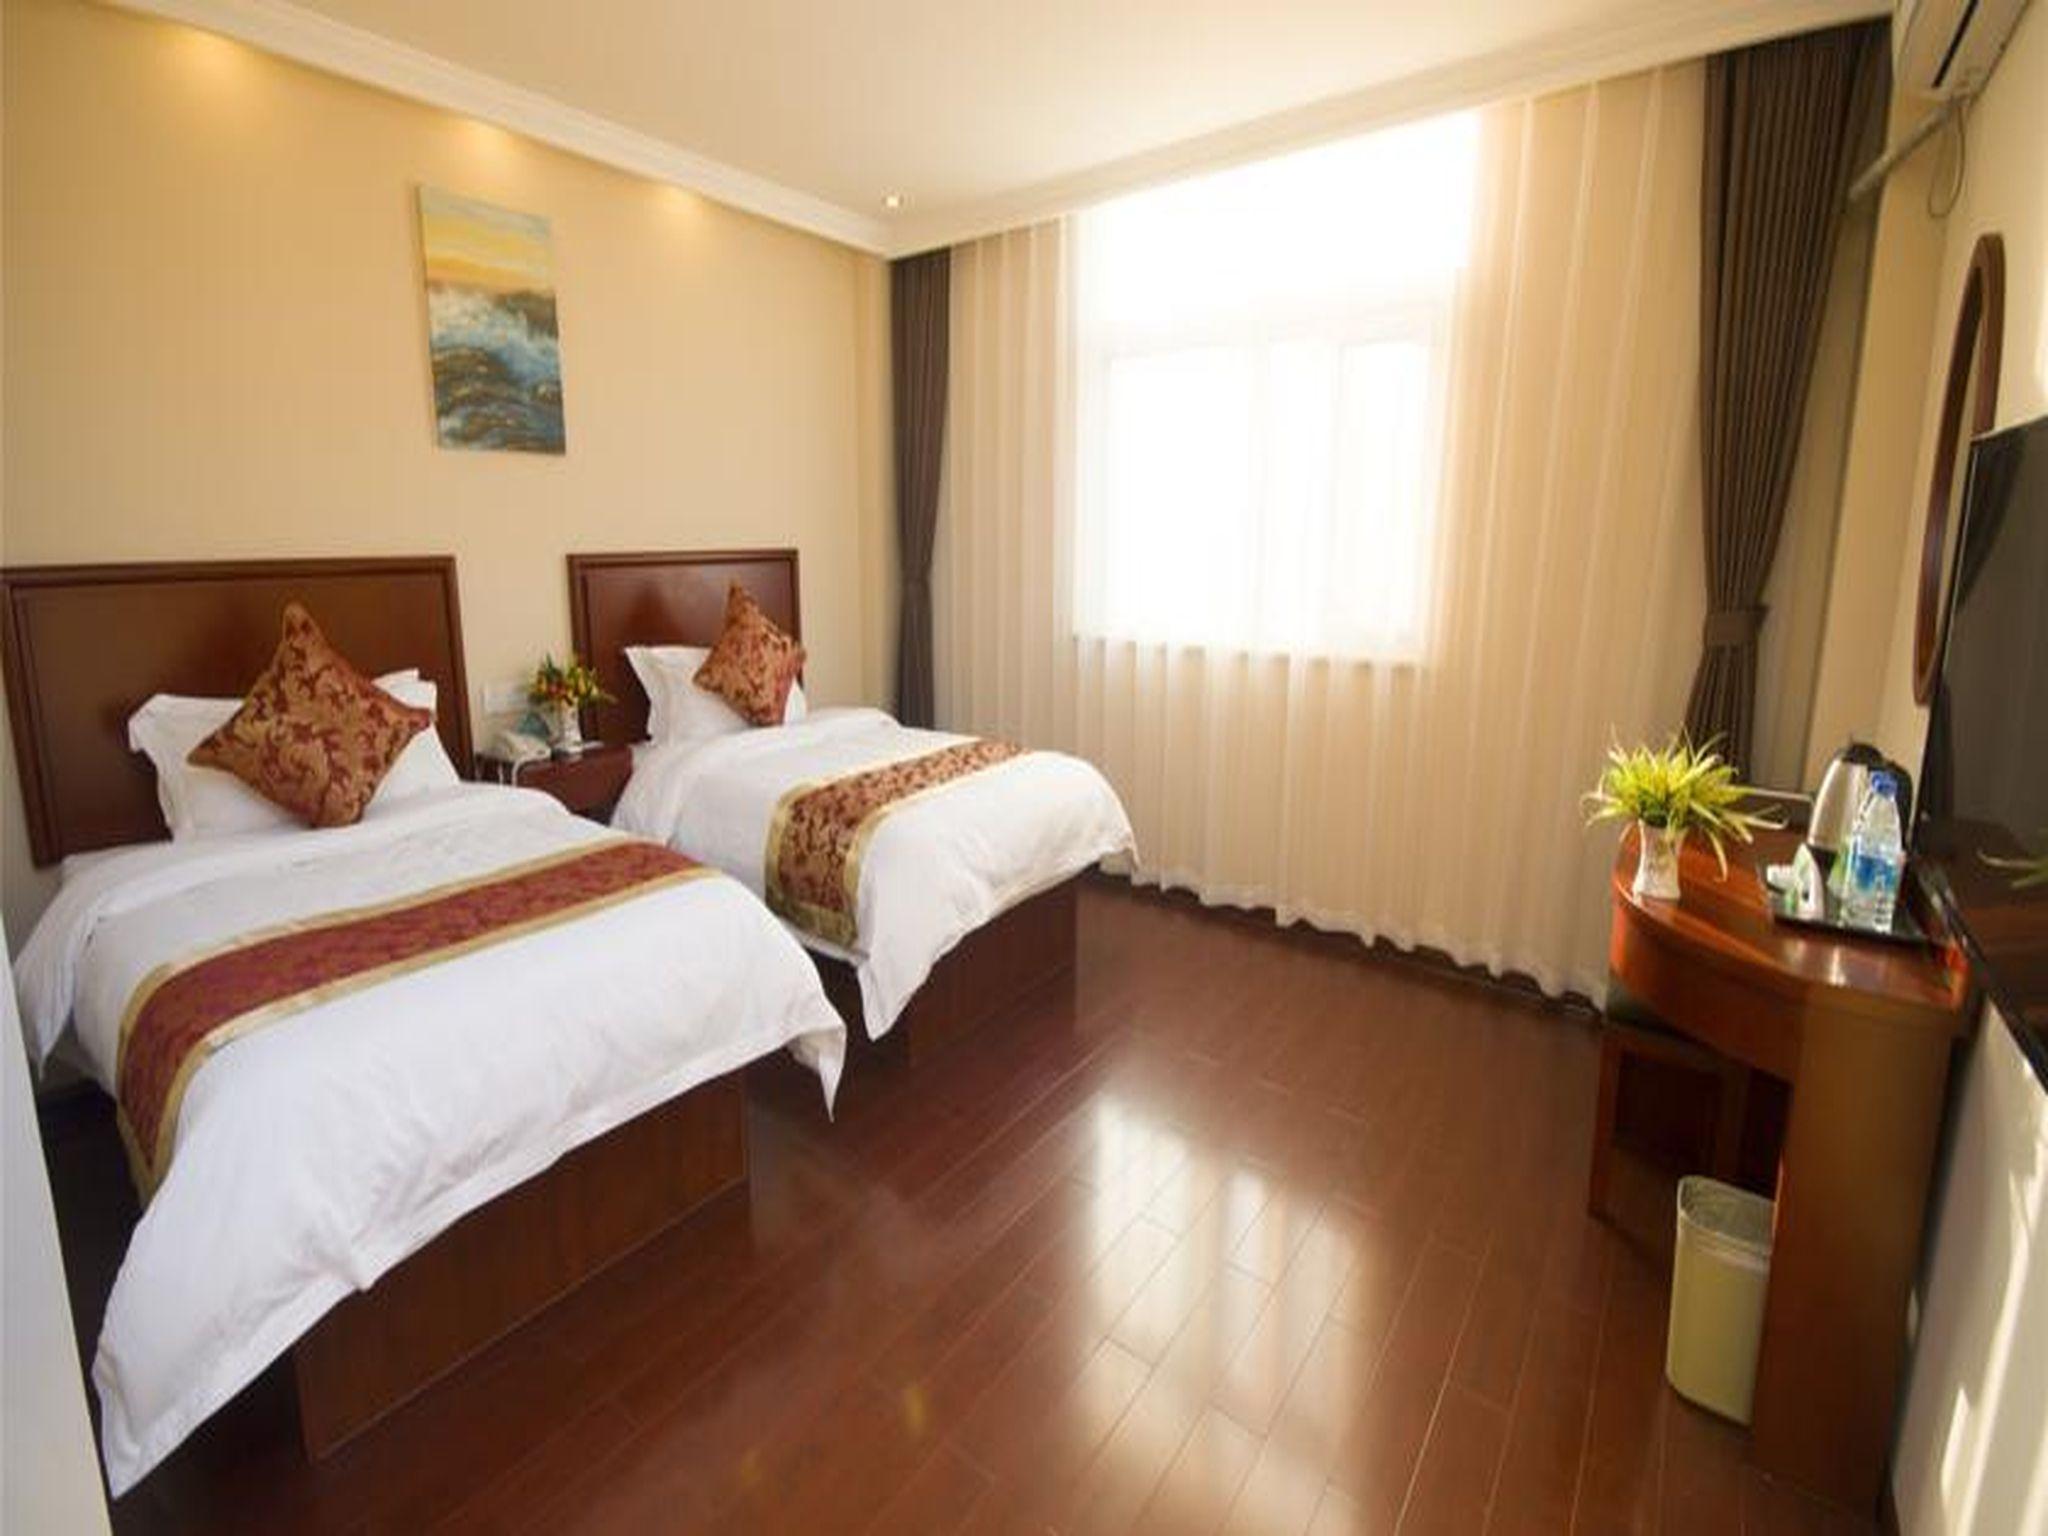 GreenTree Inn Jiangsu Nanjing Olympic Sports Center Express Hotel